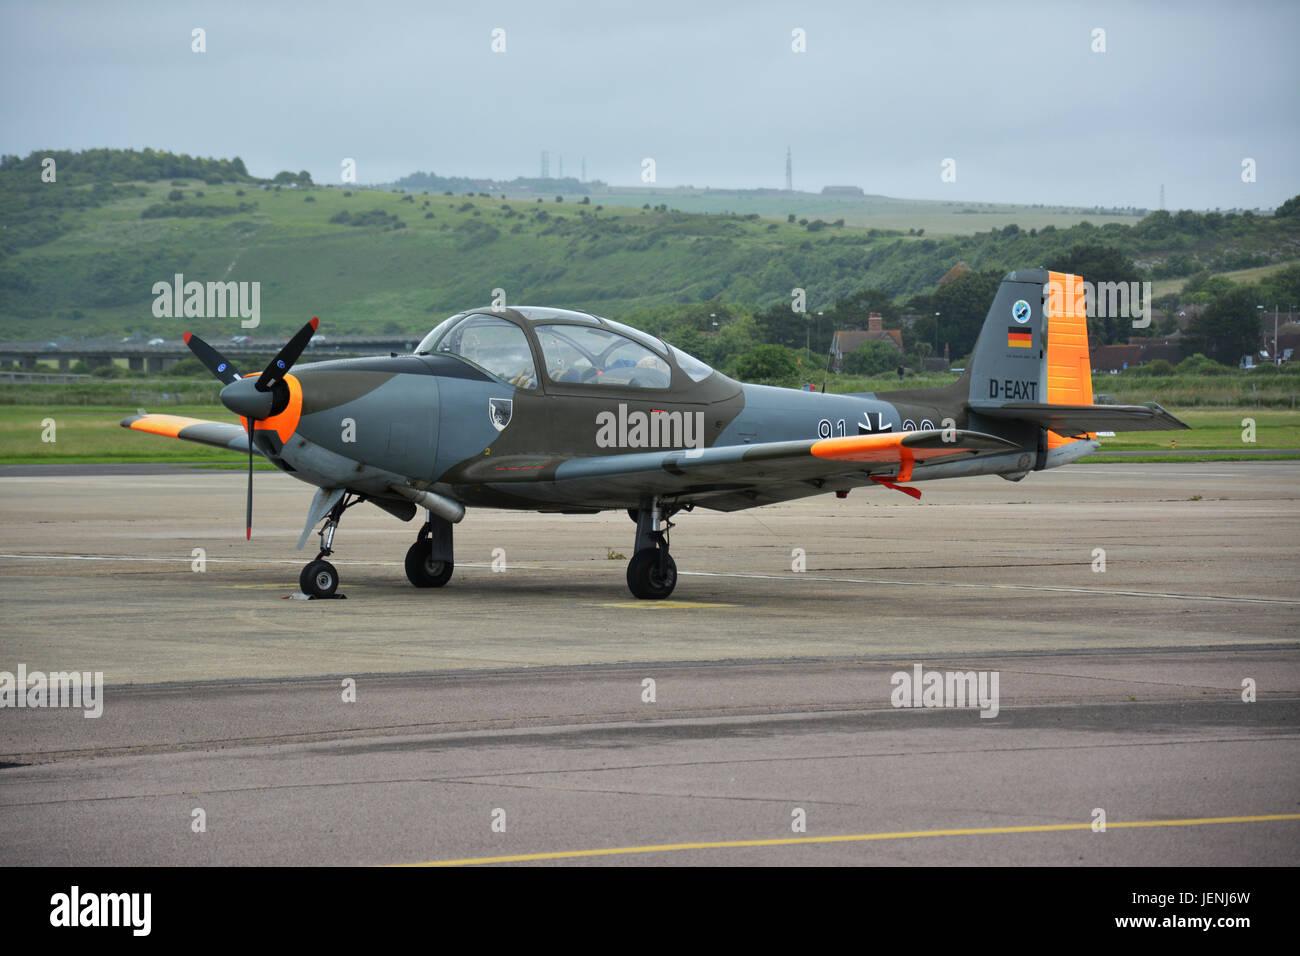 Piaggio P.149D built by Focke-Wulf - Stock Image